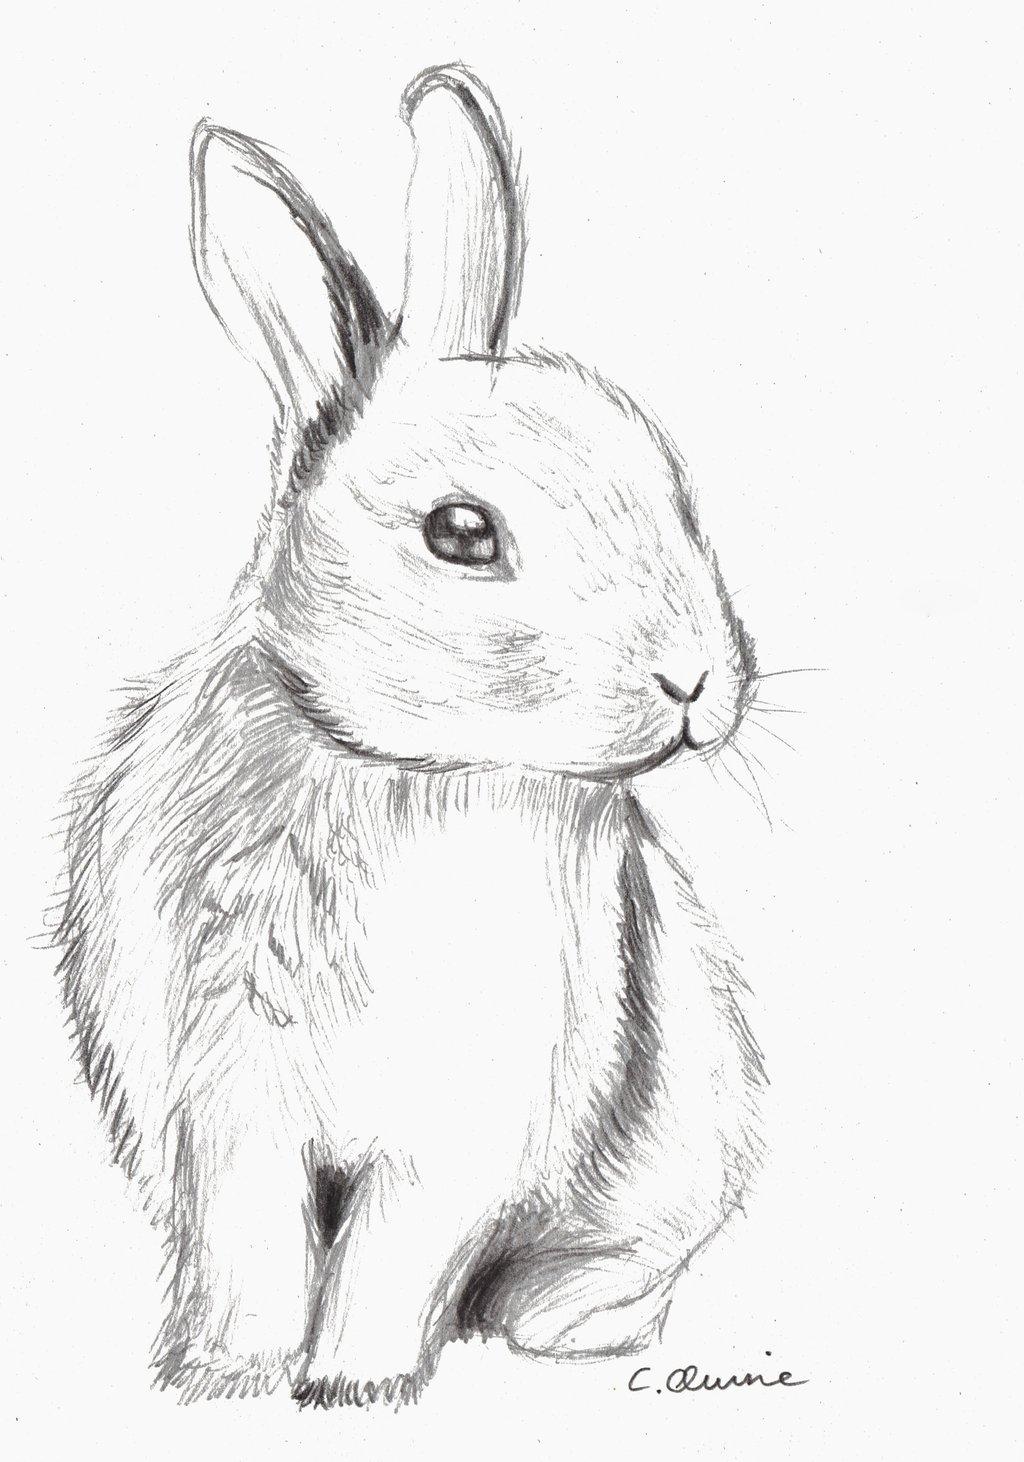 Drawn rabbit sketch 0o een  by ze